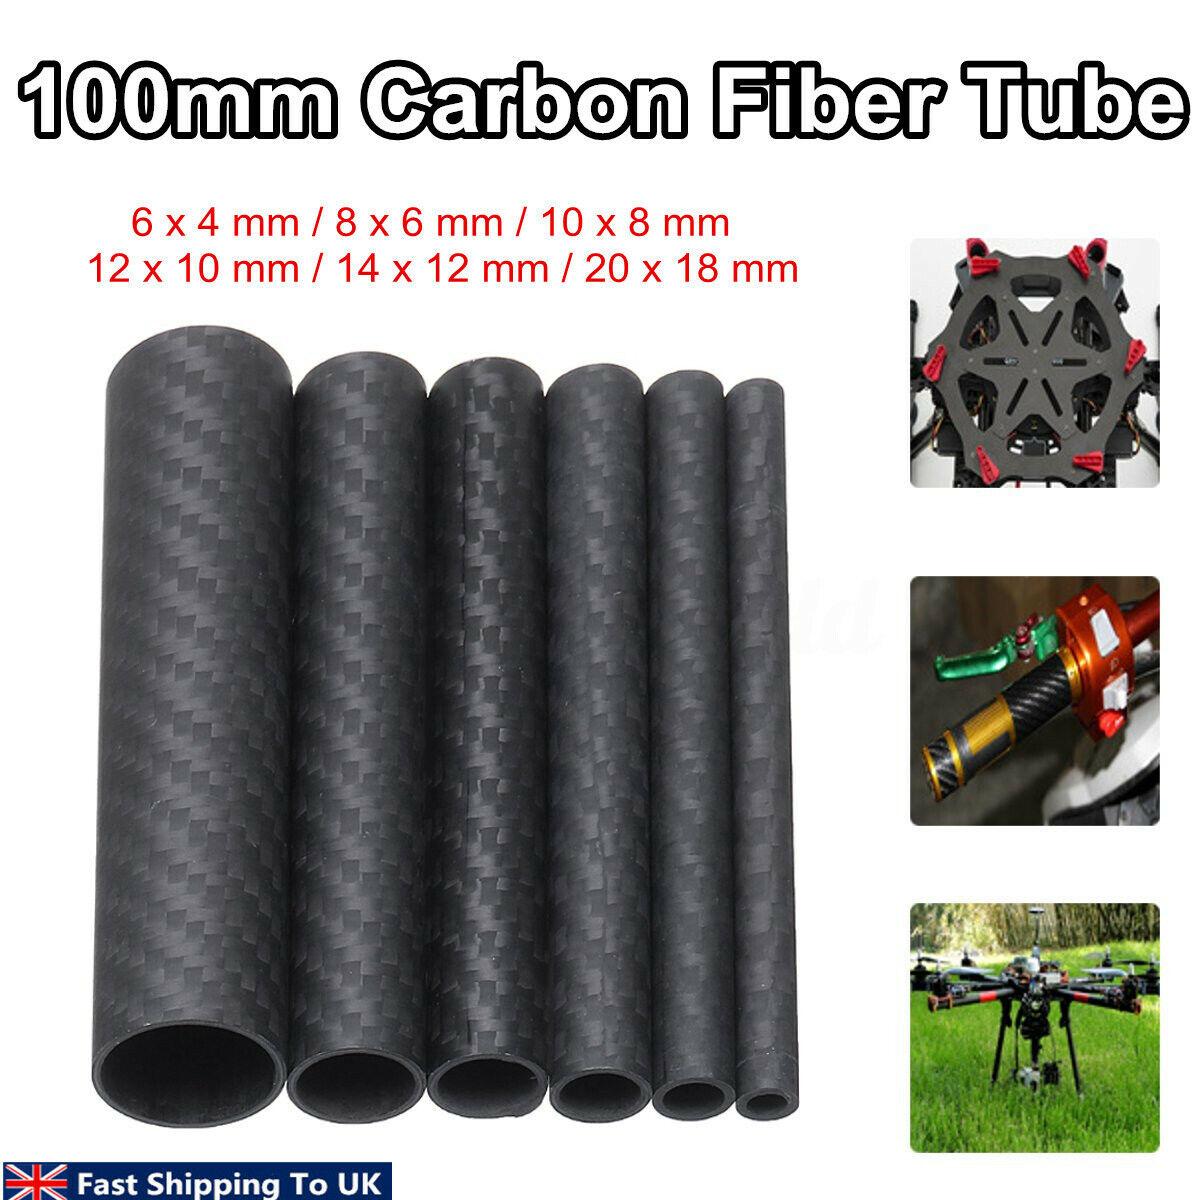 2.6mm x 10mm STEEL POZI SCREWS CIGAR DOLLSHOUSE TINY MICRO MODEL MINIATURE SCREW